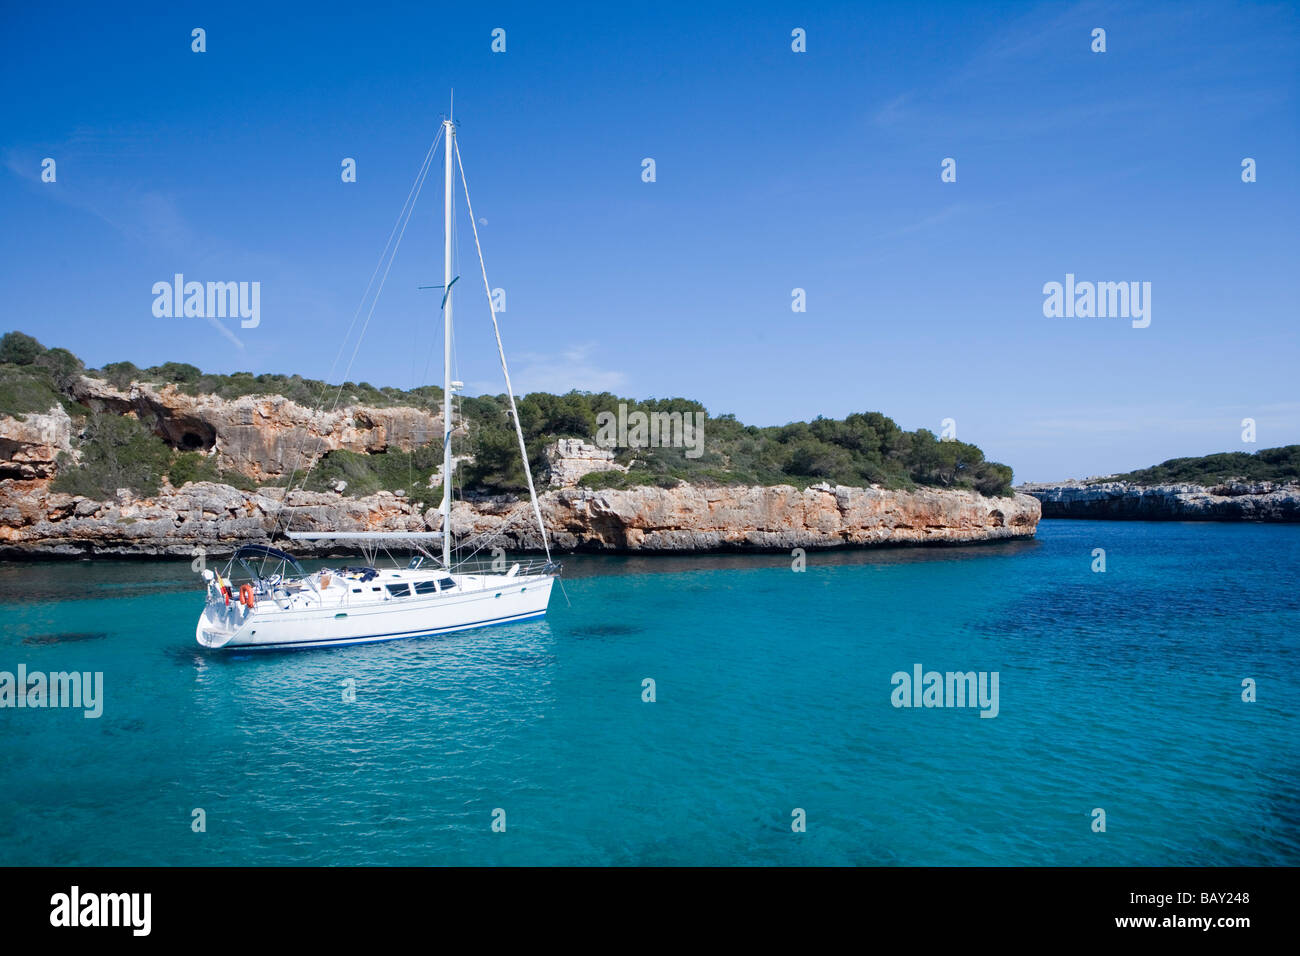 Sailboat at Cala sa Nau Cove, Cala sa Nau, Mallorca, Balearic Islands, Spain - Stock Image